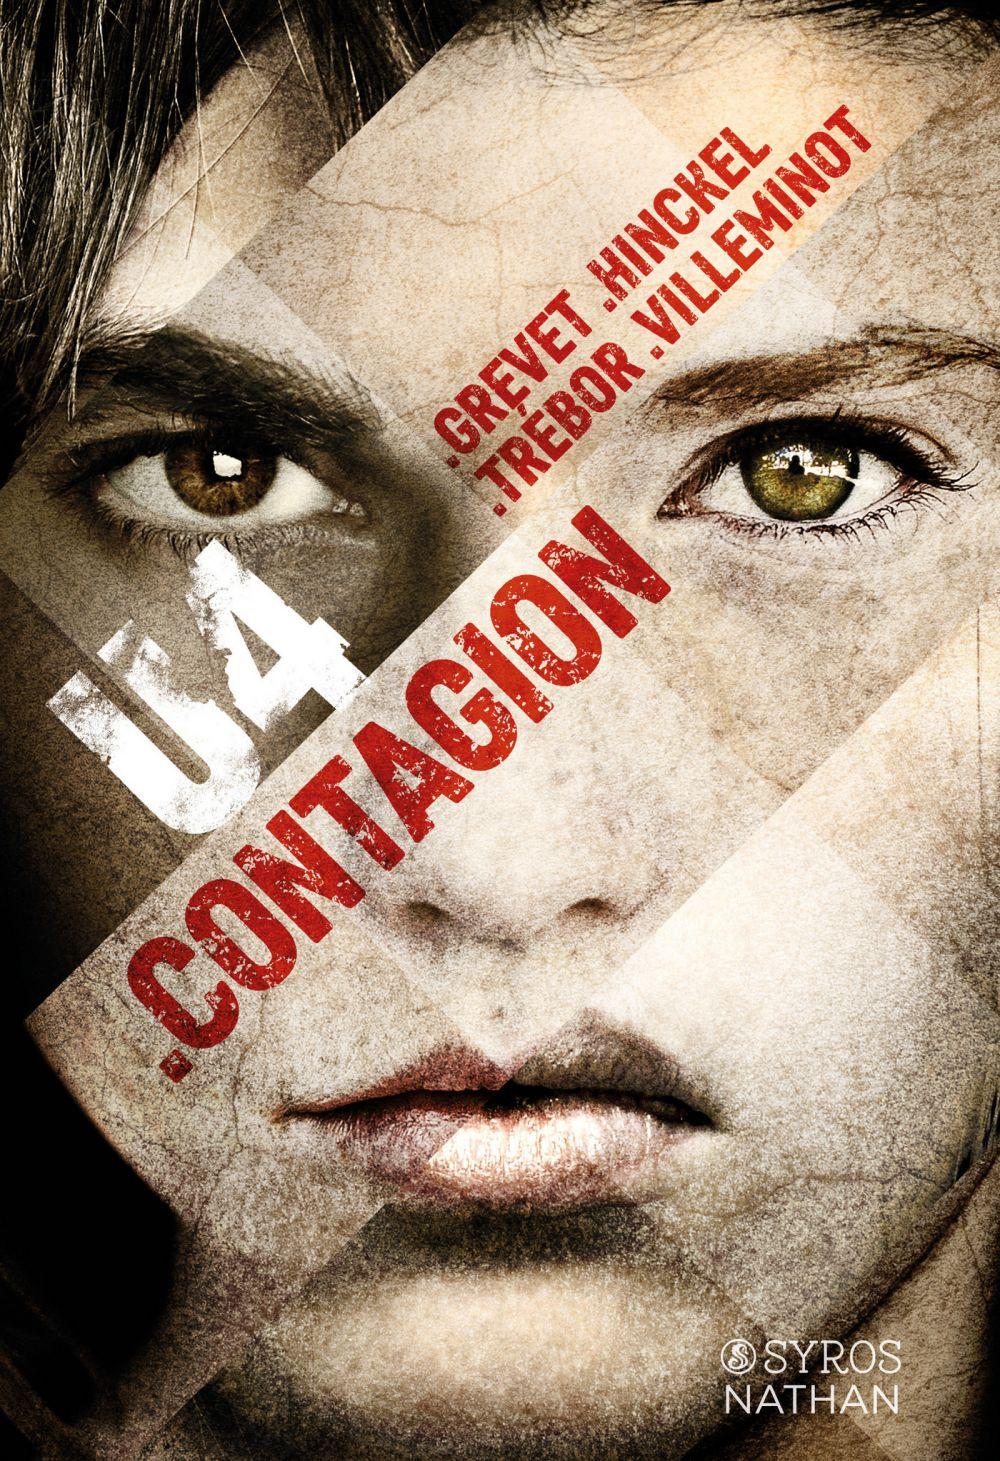 U4.Contagion |